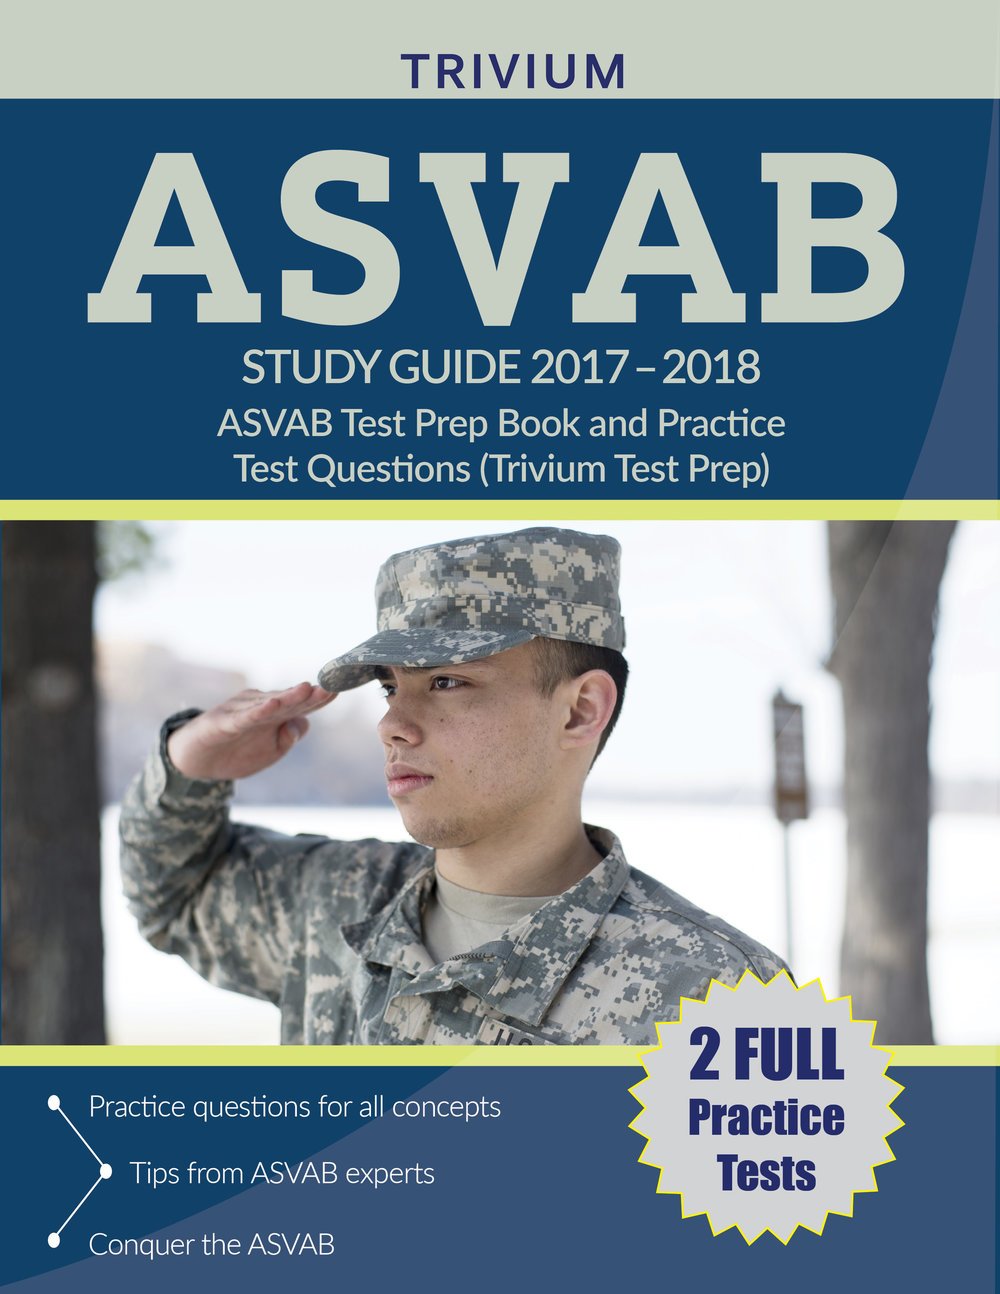 ASVAB Study Guide 2017-2018